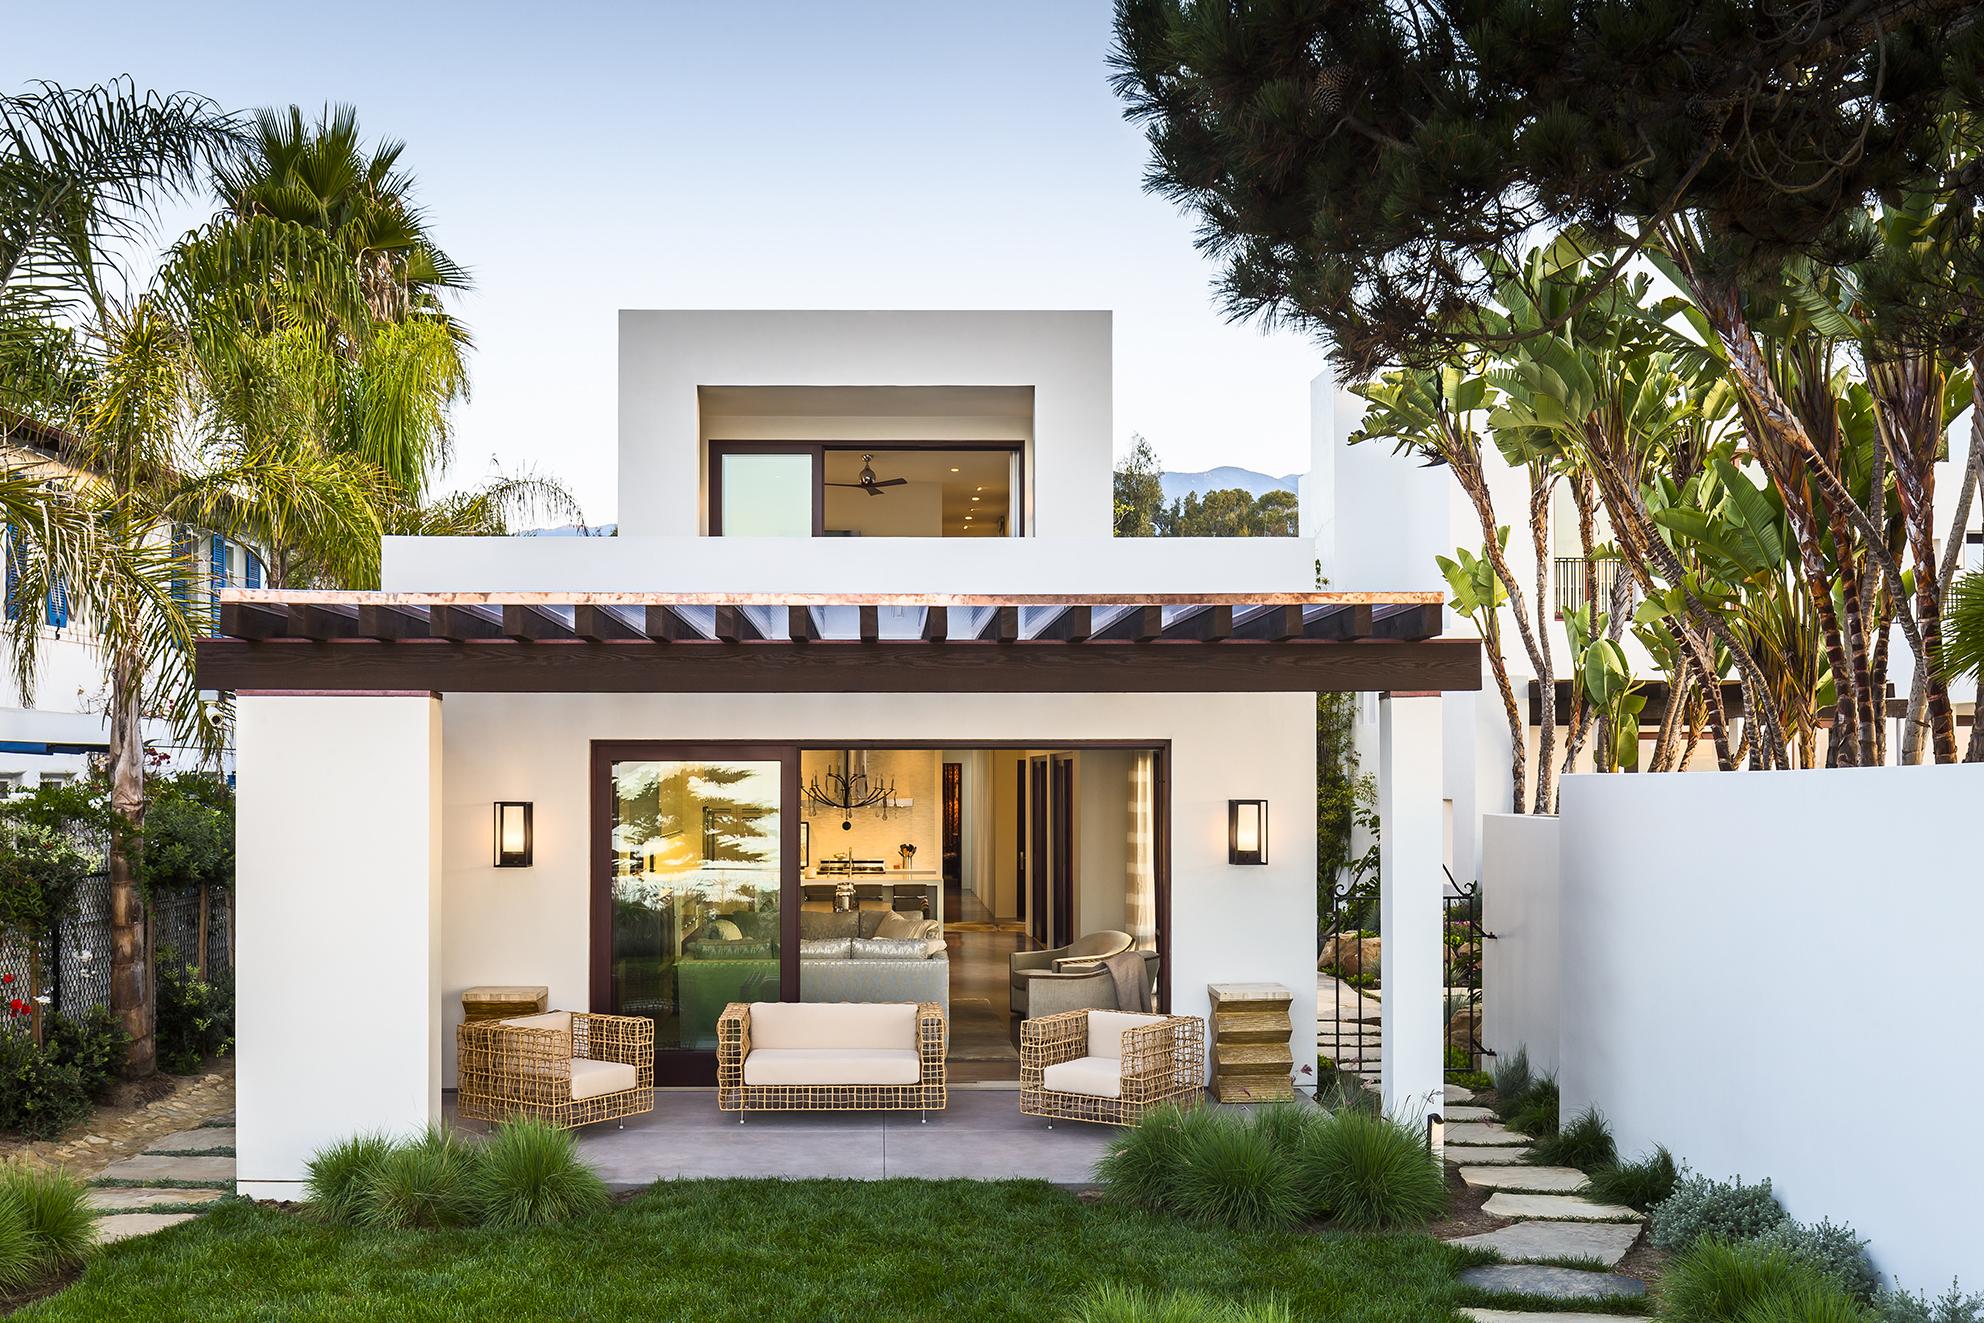 Aia santa barbara announces 2015 design awards architect for Santa barbara style architecture